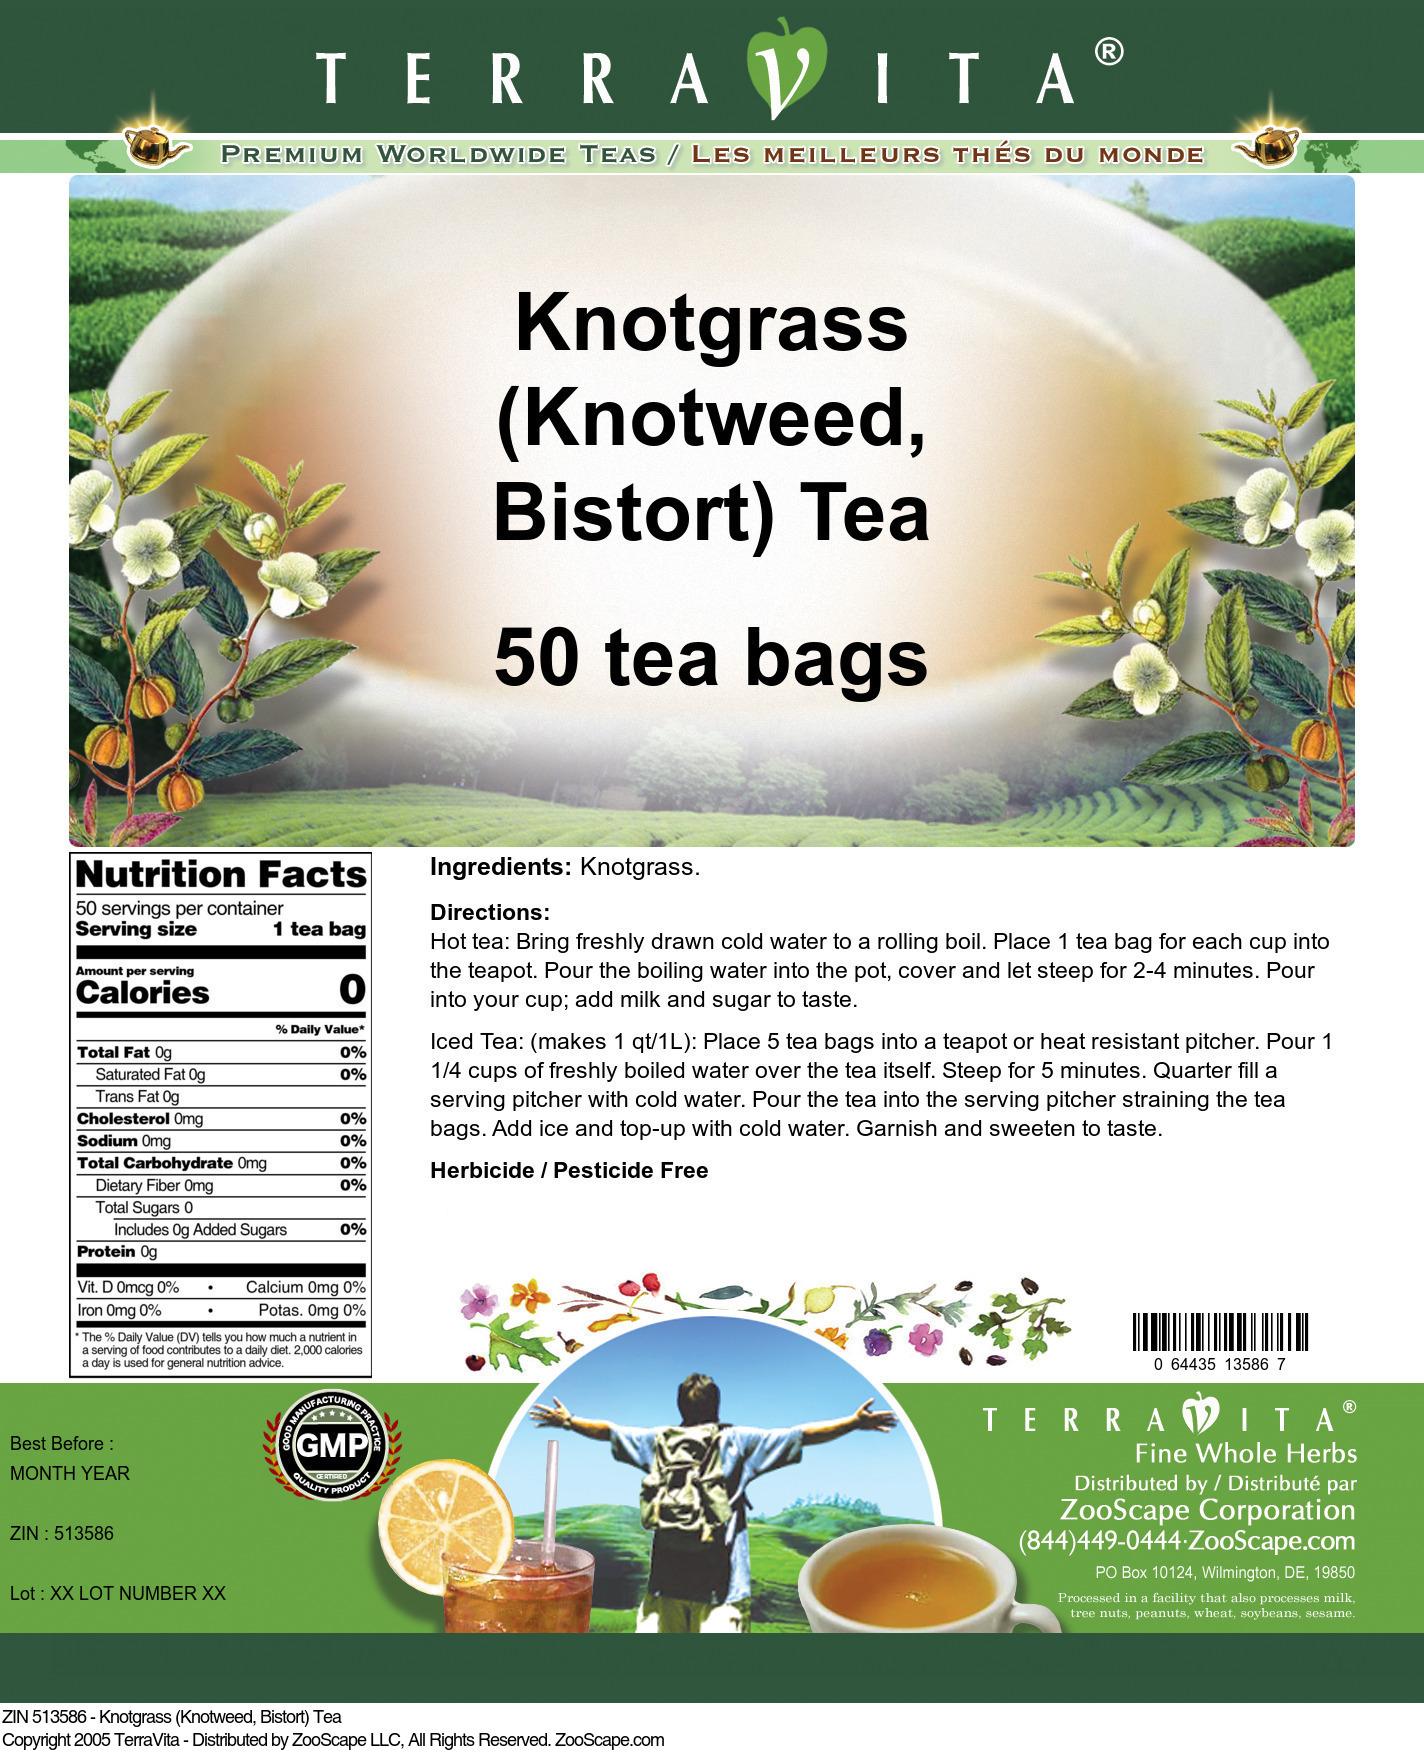 Knotgrass (Knotweed, Bistort) Tea